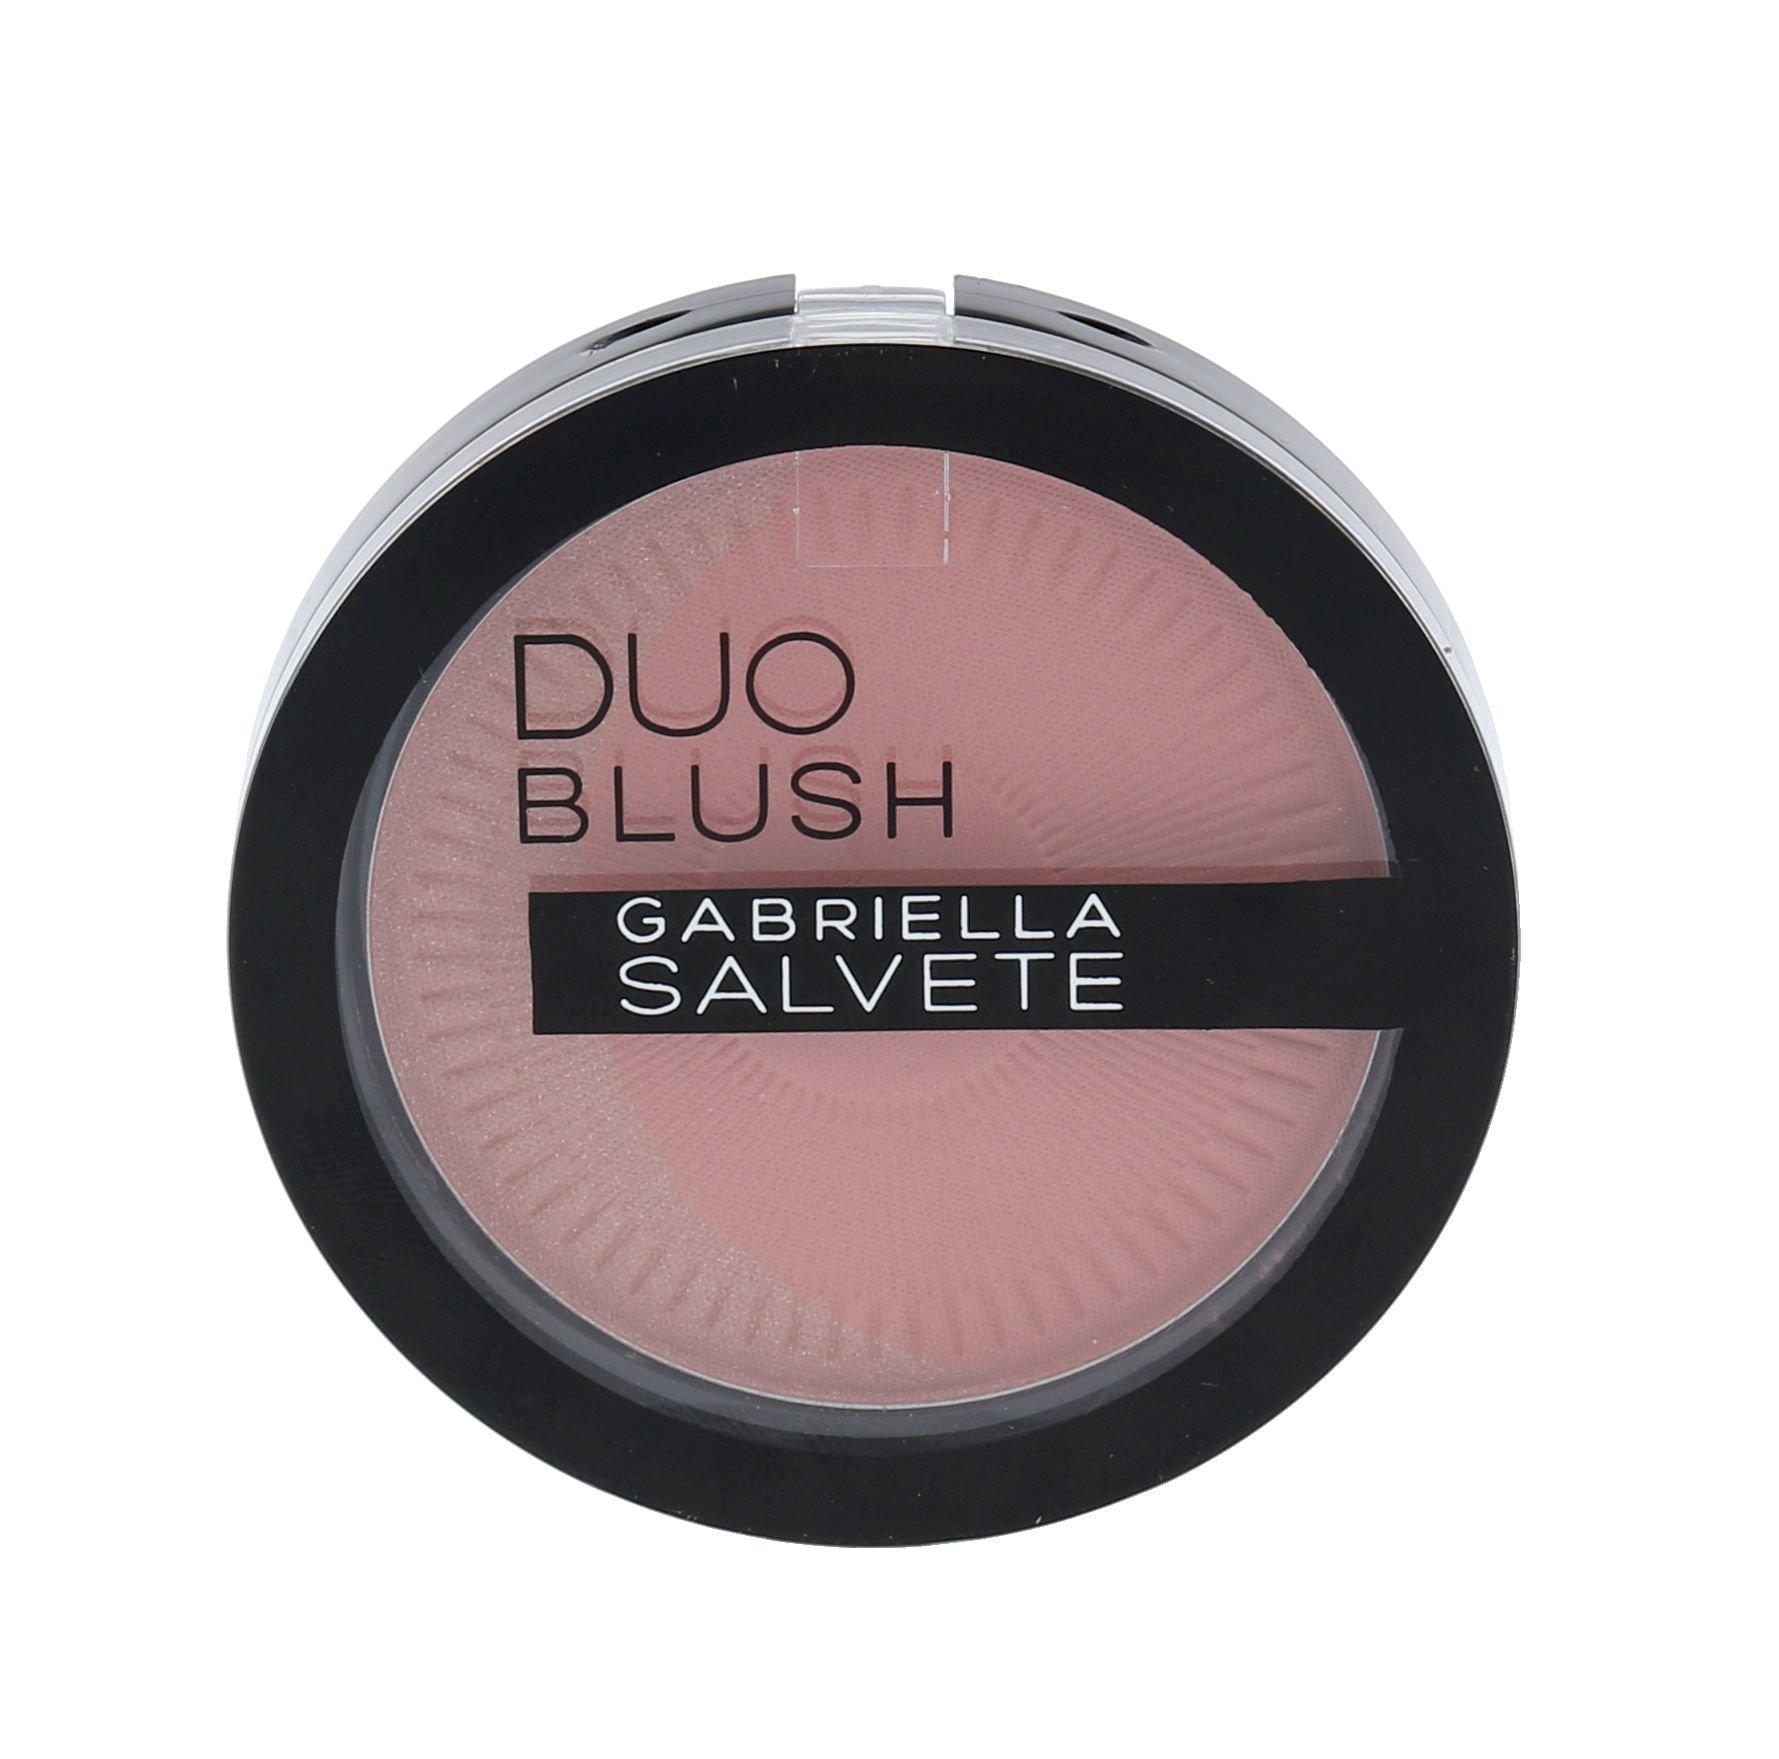 Gabriella Salvete Duo Blush Cosmetic 8g 03